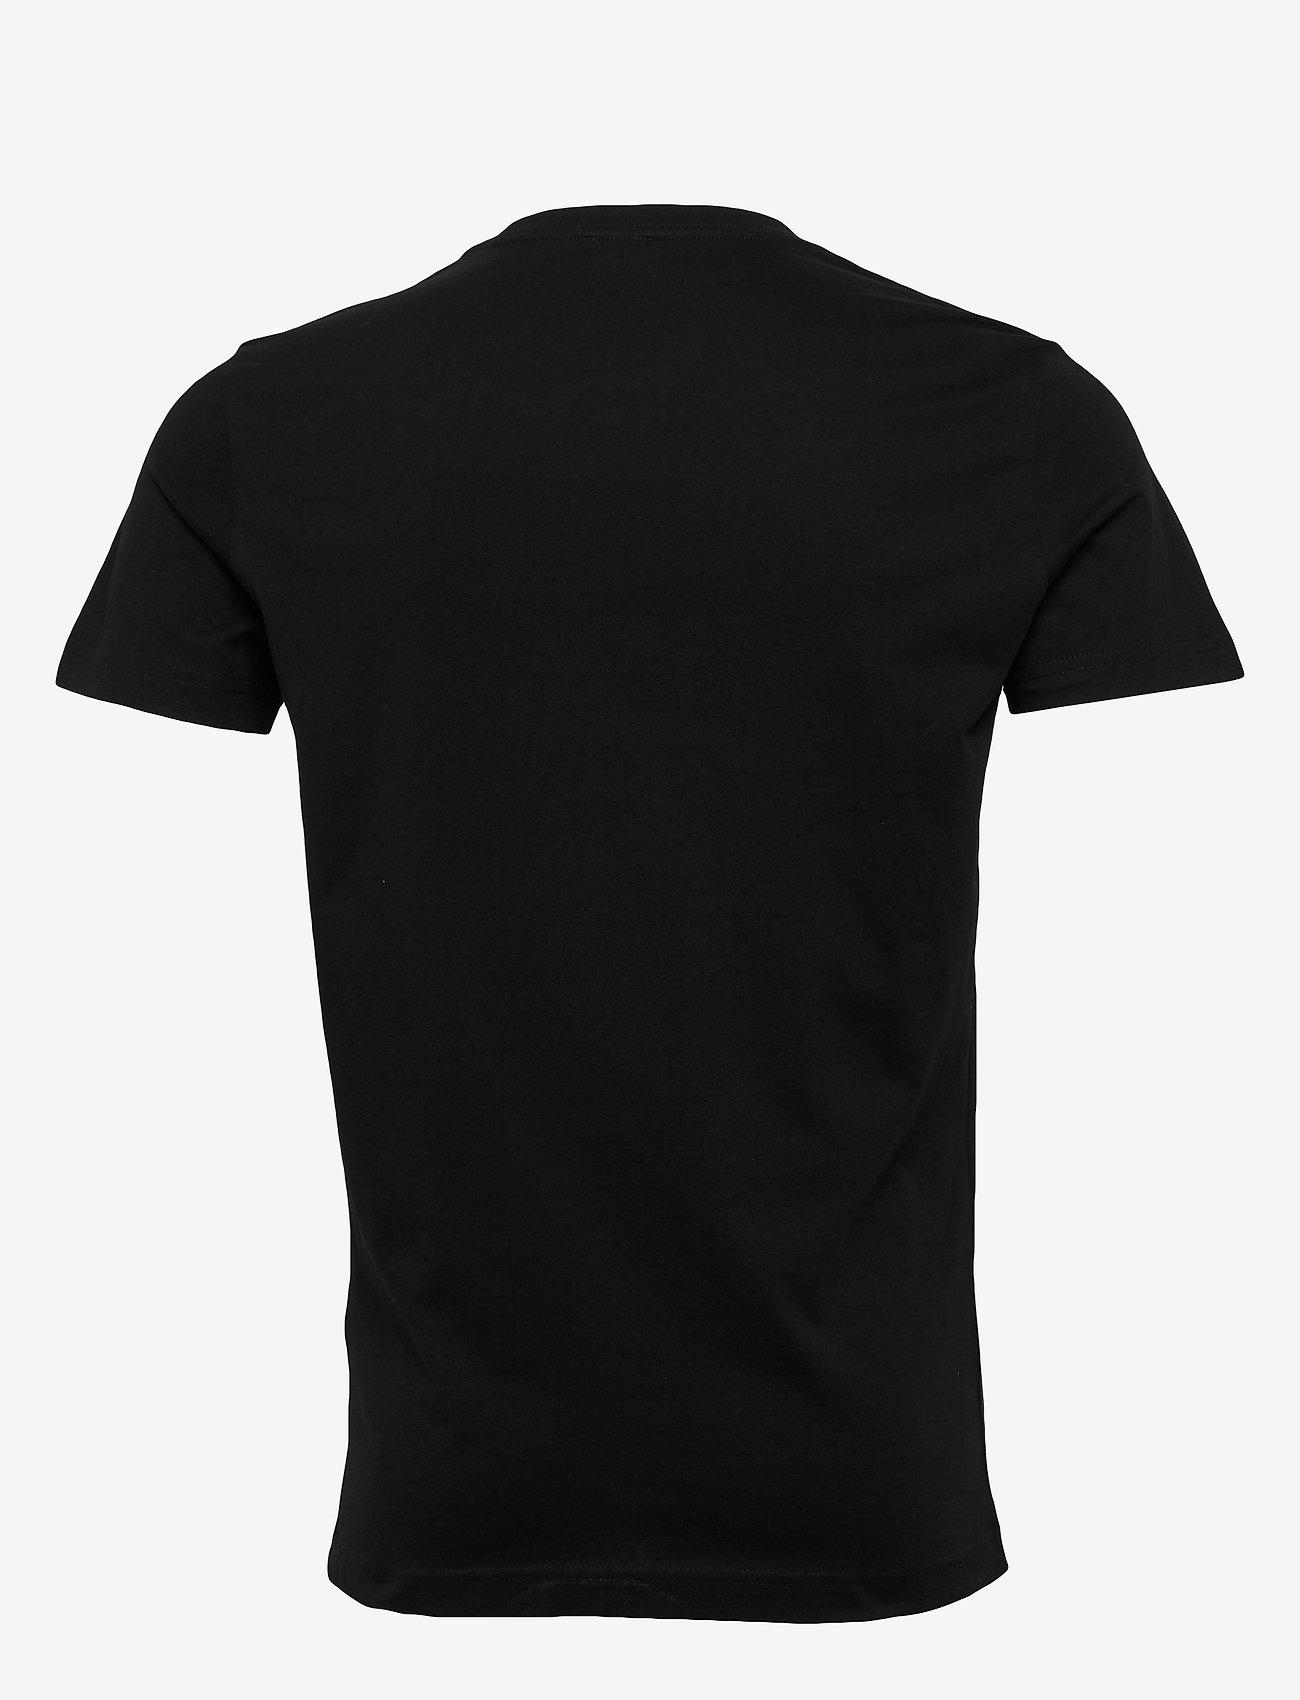 Diesel Men - T-DIEGO-LOGO T-SHIRT - short-sleeved t-shirts - black - 1